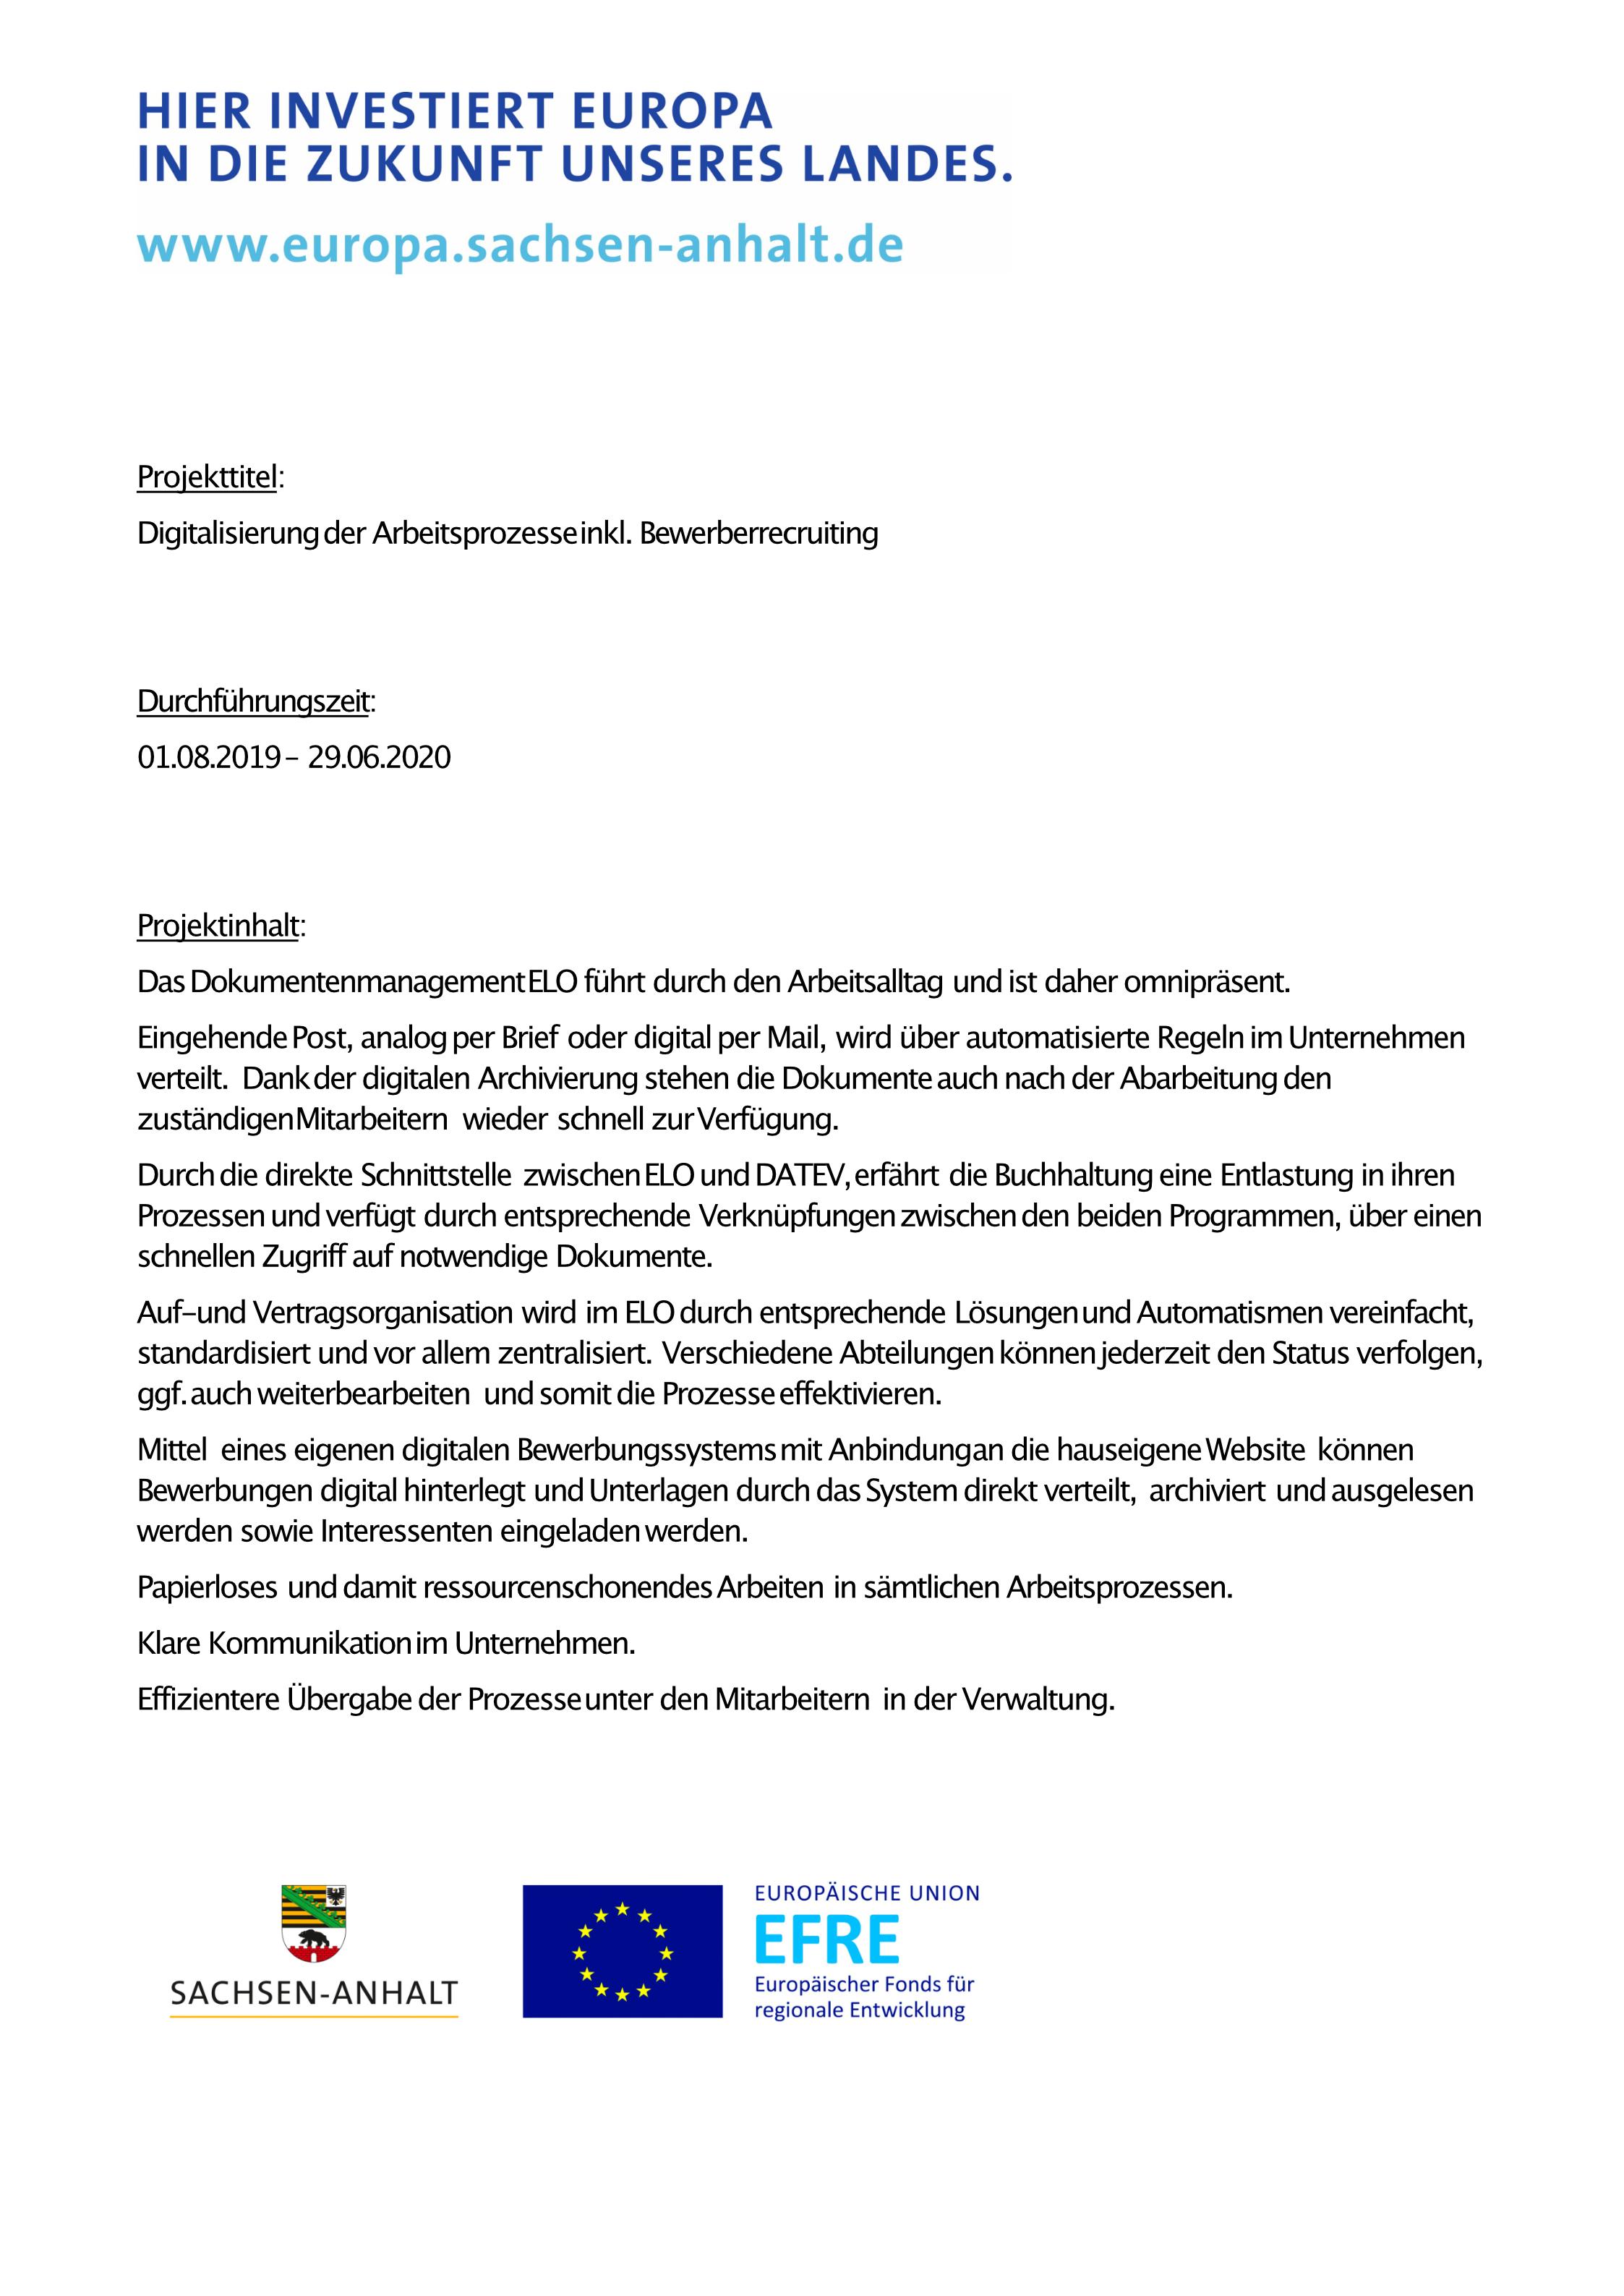 Investitionsbank Sachsen-Anhalt A3 Plakat - Projekt